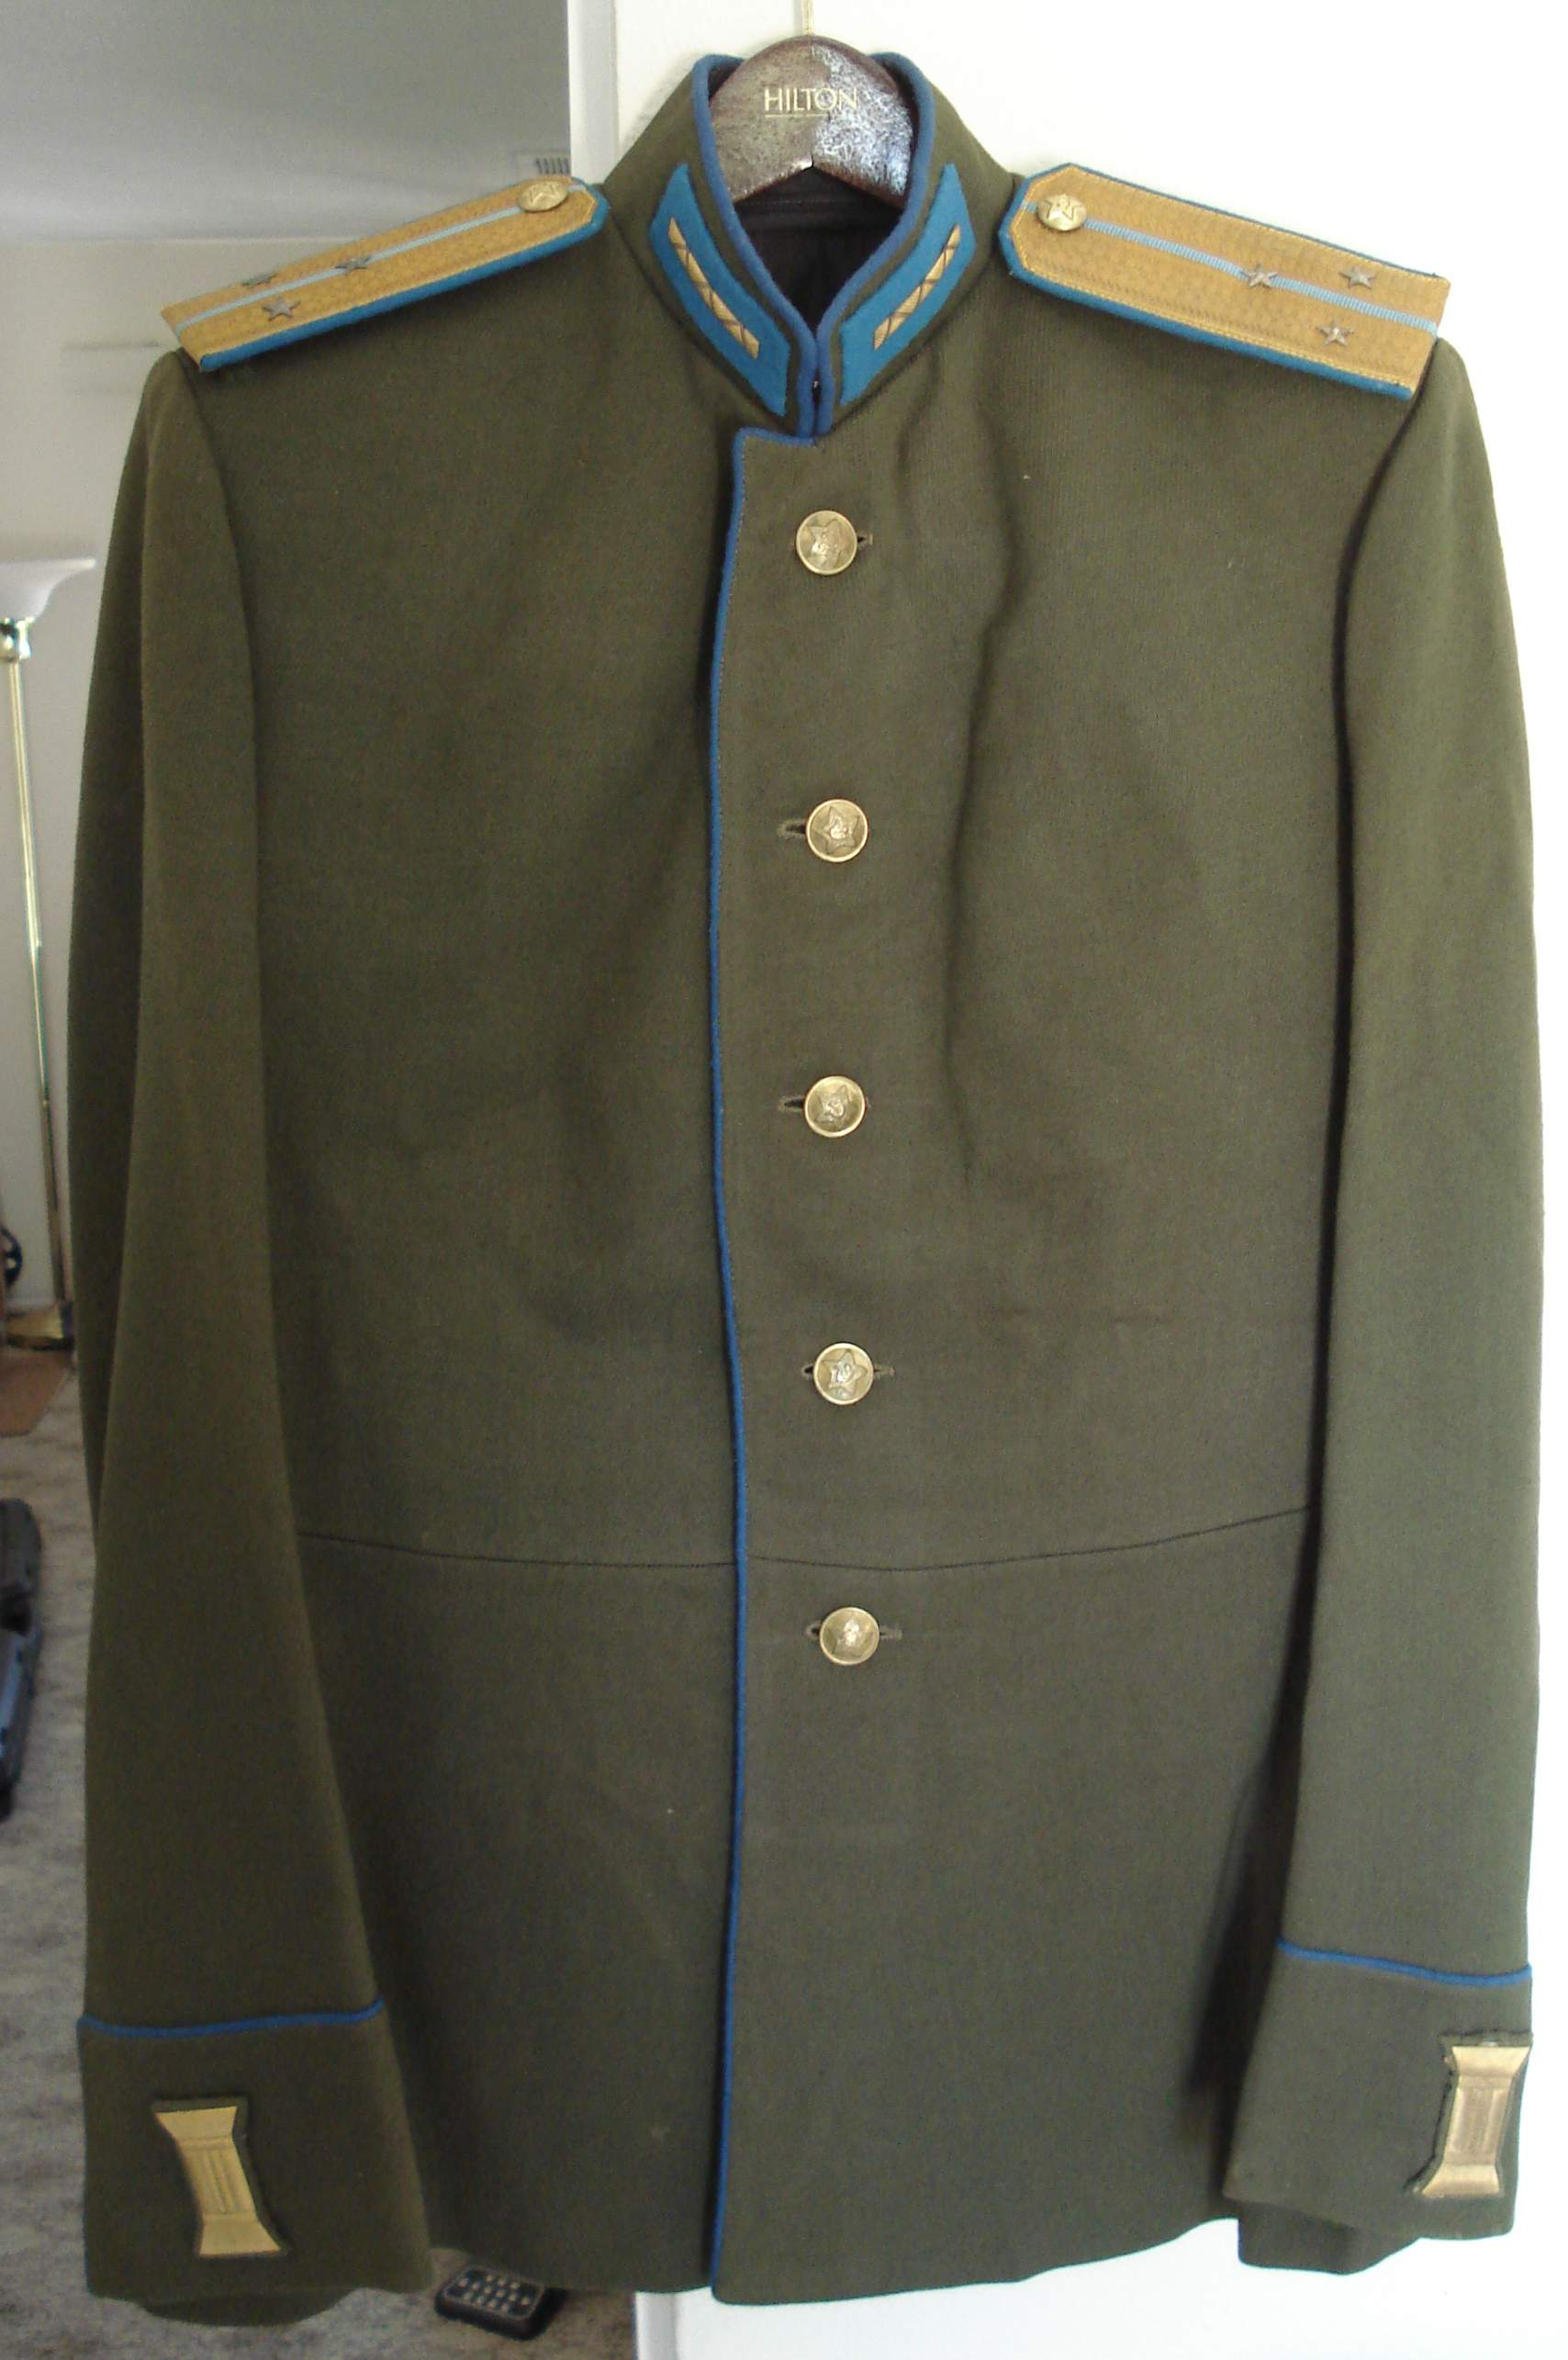 M43 Air Force Or Kgb Parade Uniform